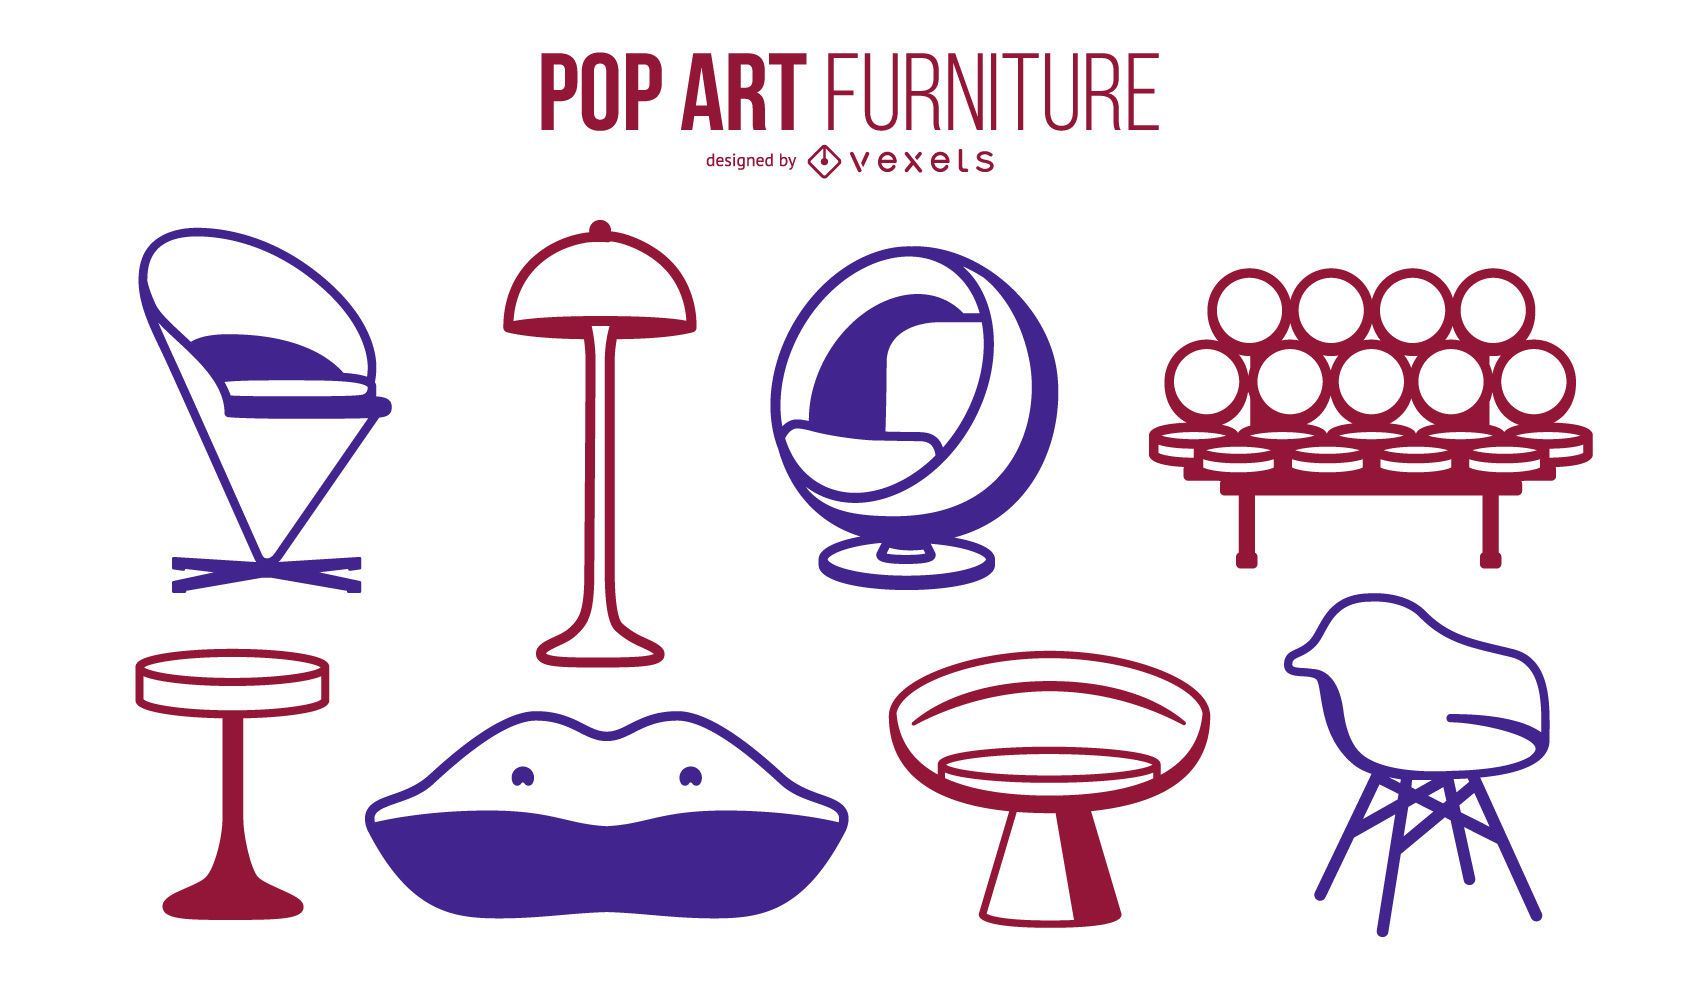 Pop art furniture stroke set